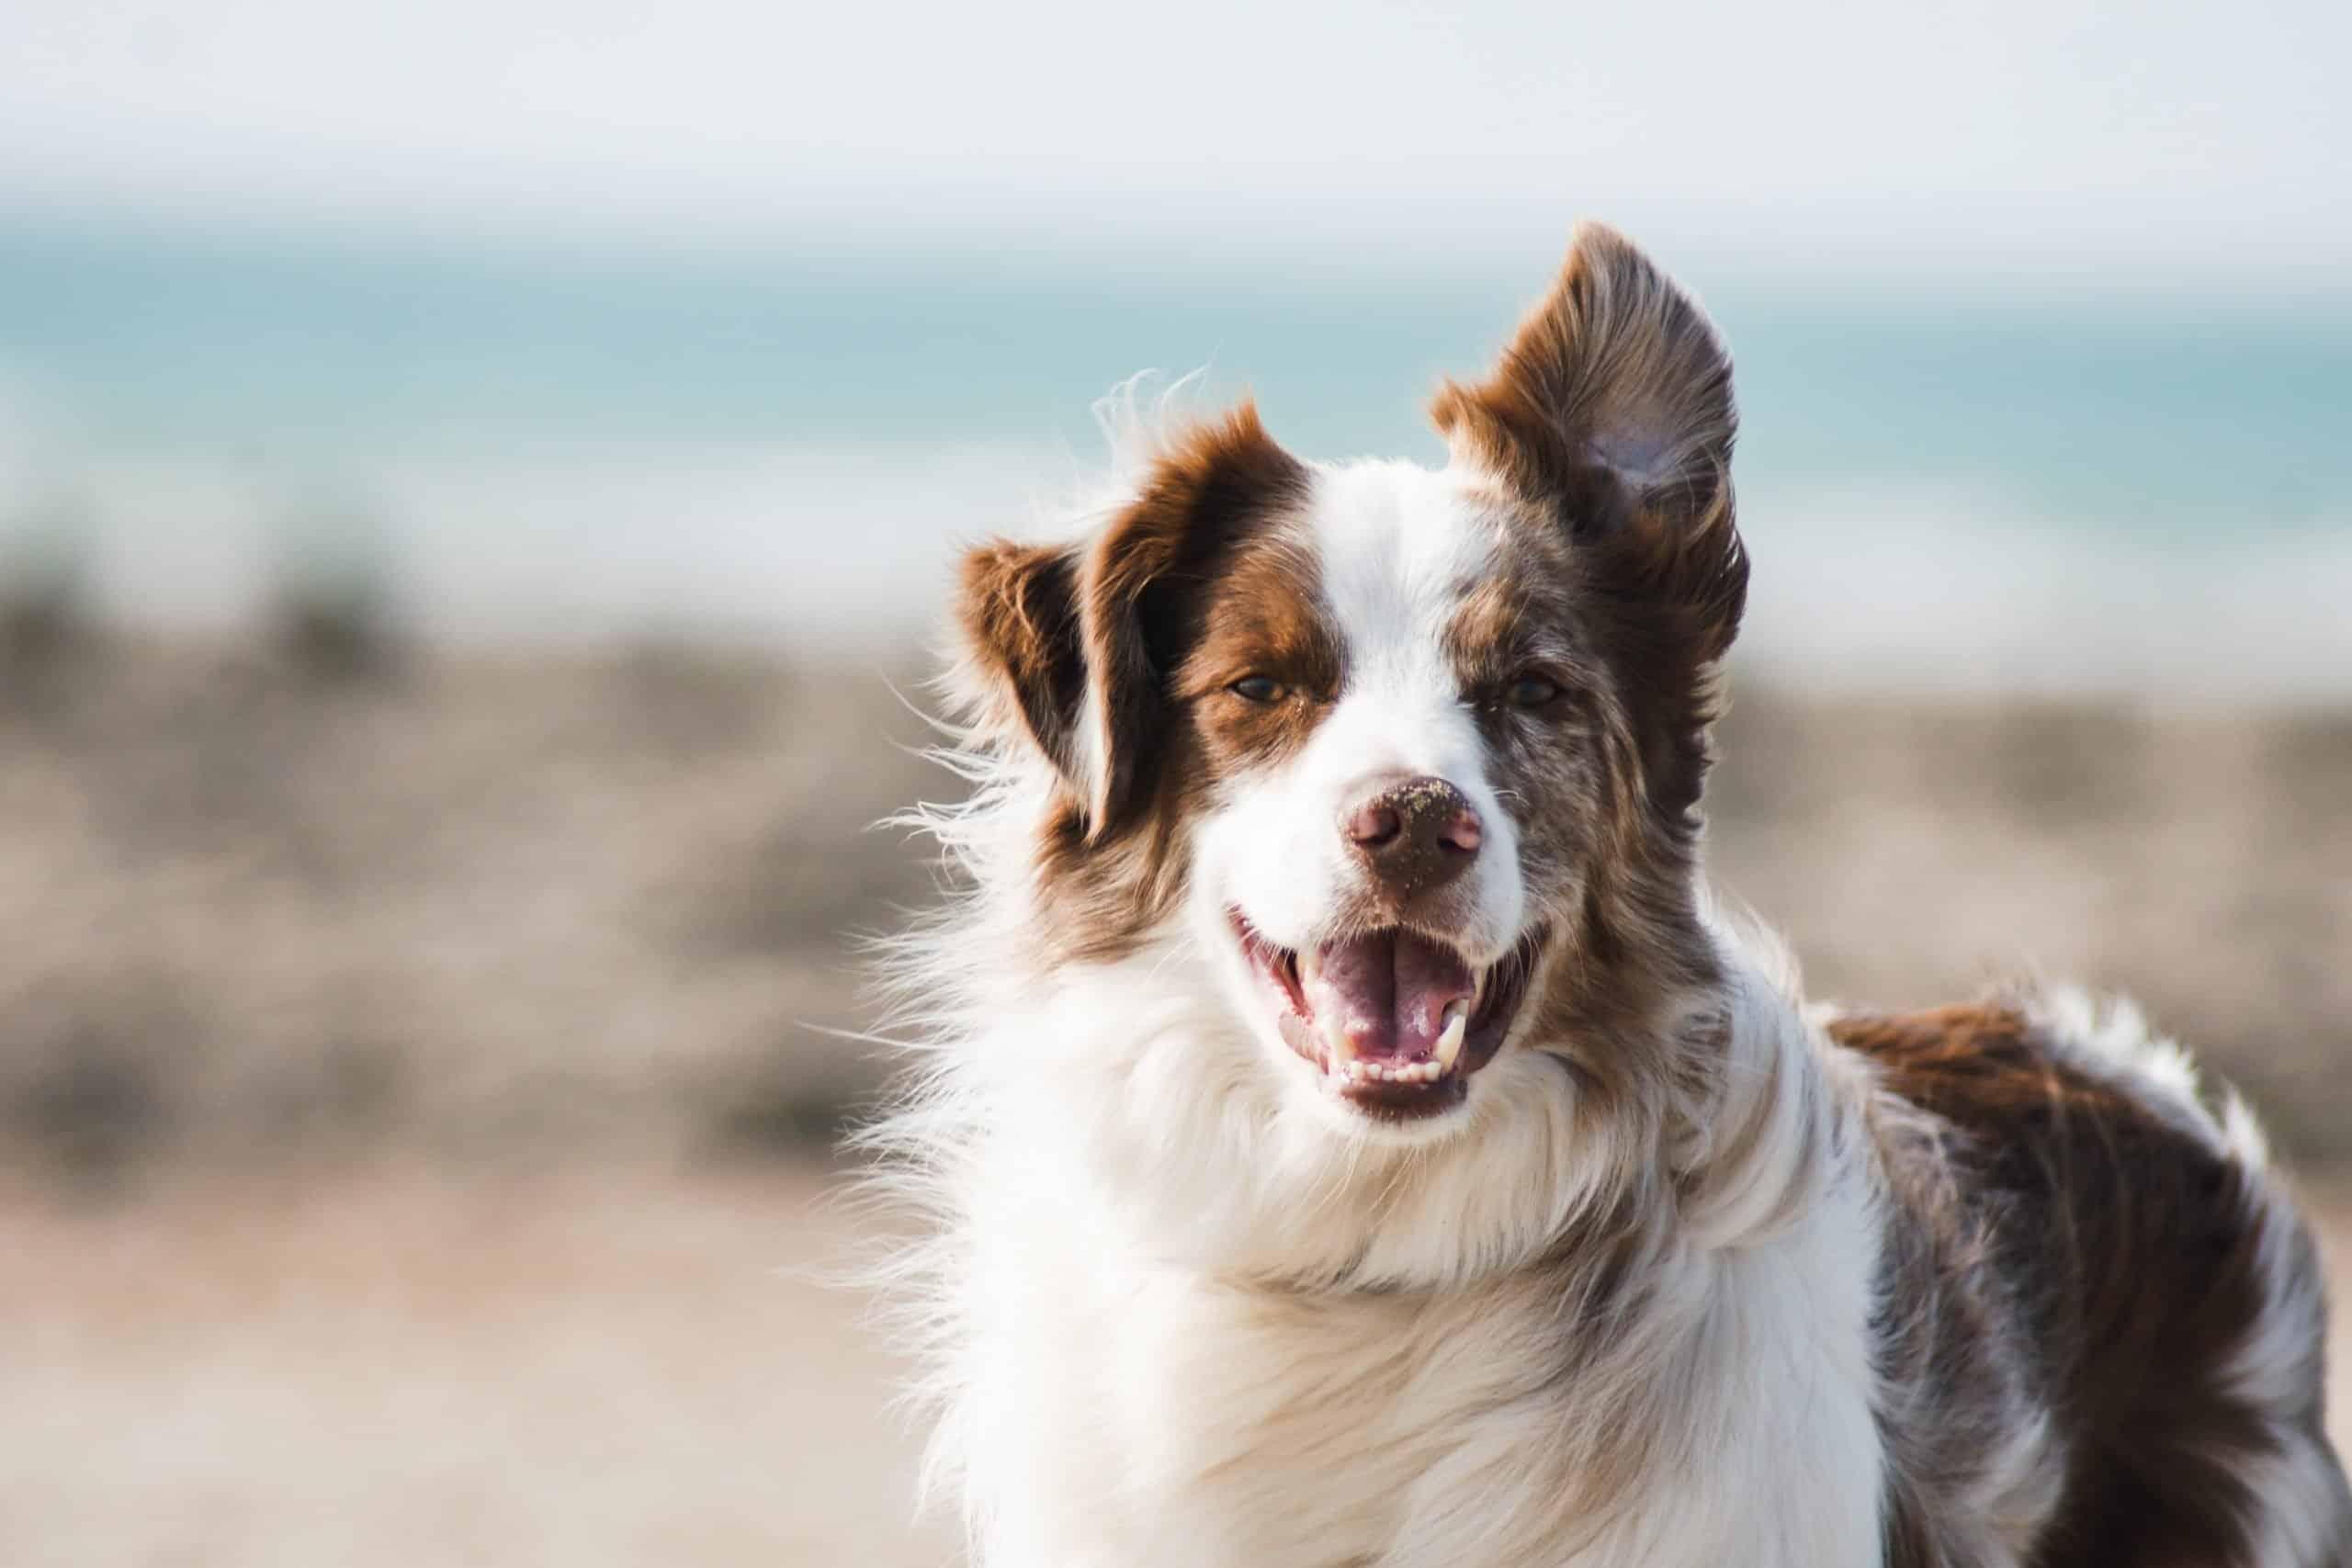 Beautiful dog on the beach.